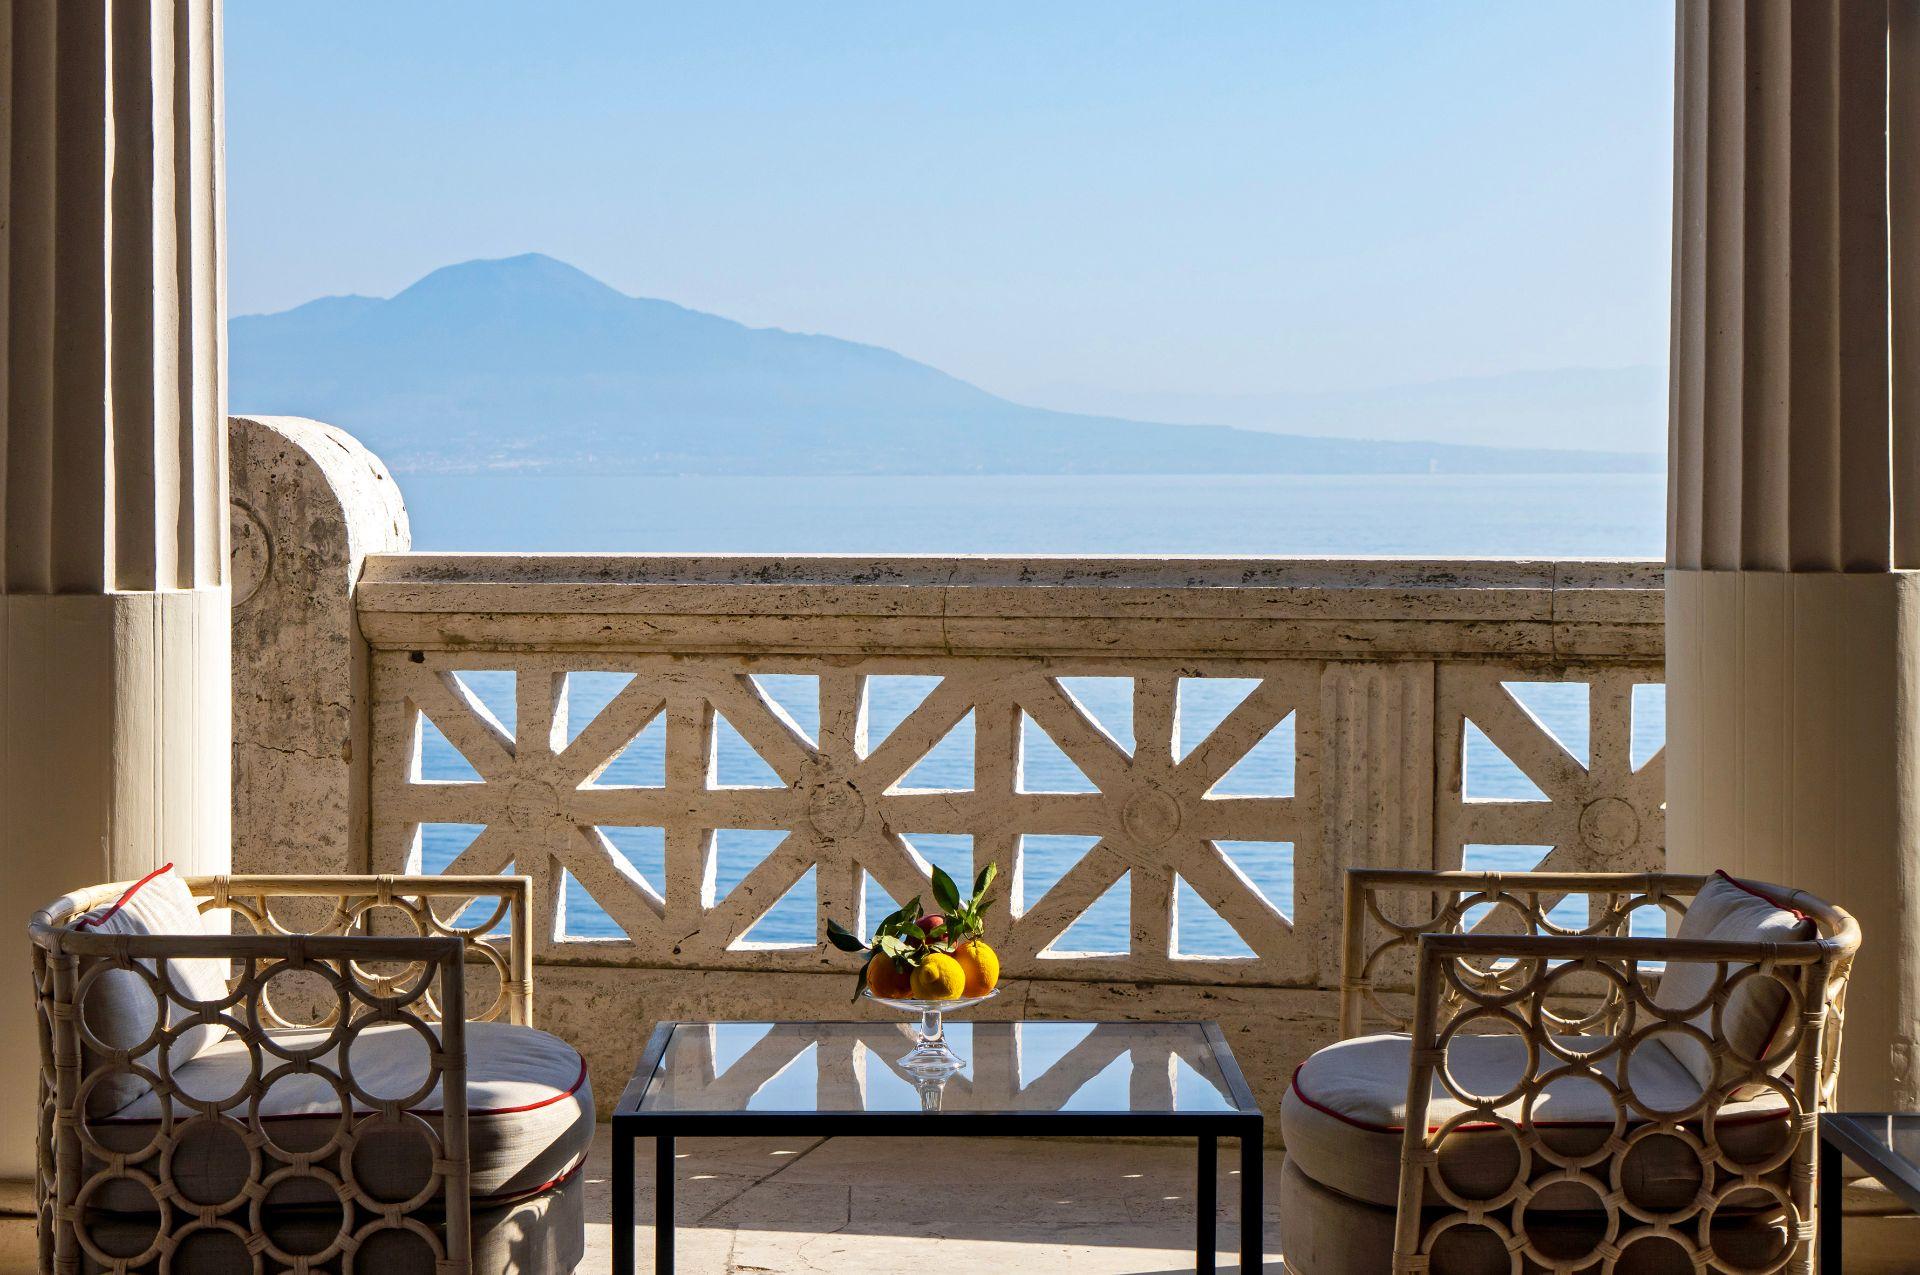 Villa pompeiana, weddings and event, sea view terrace, Bellevue Syrene Sorrento.